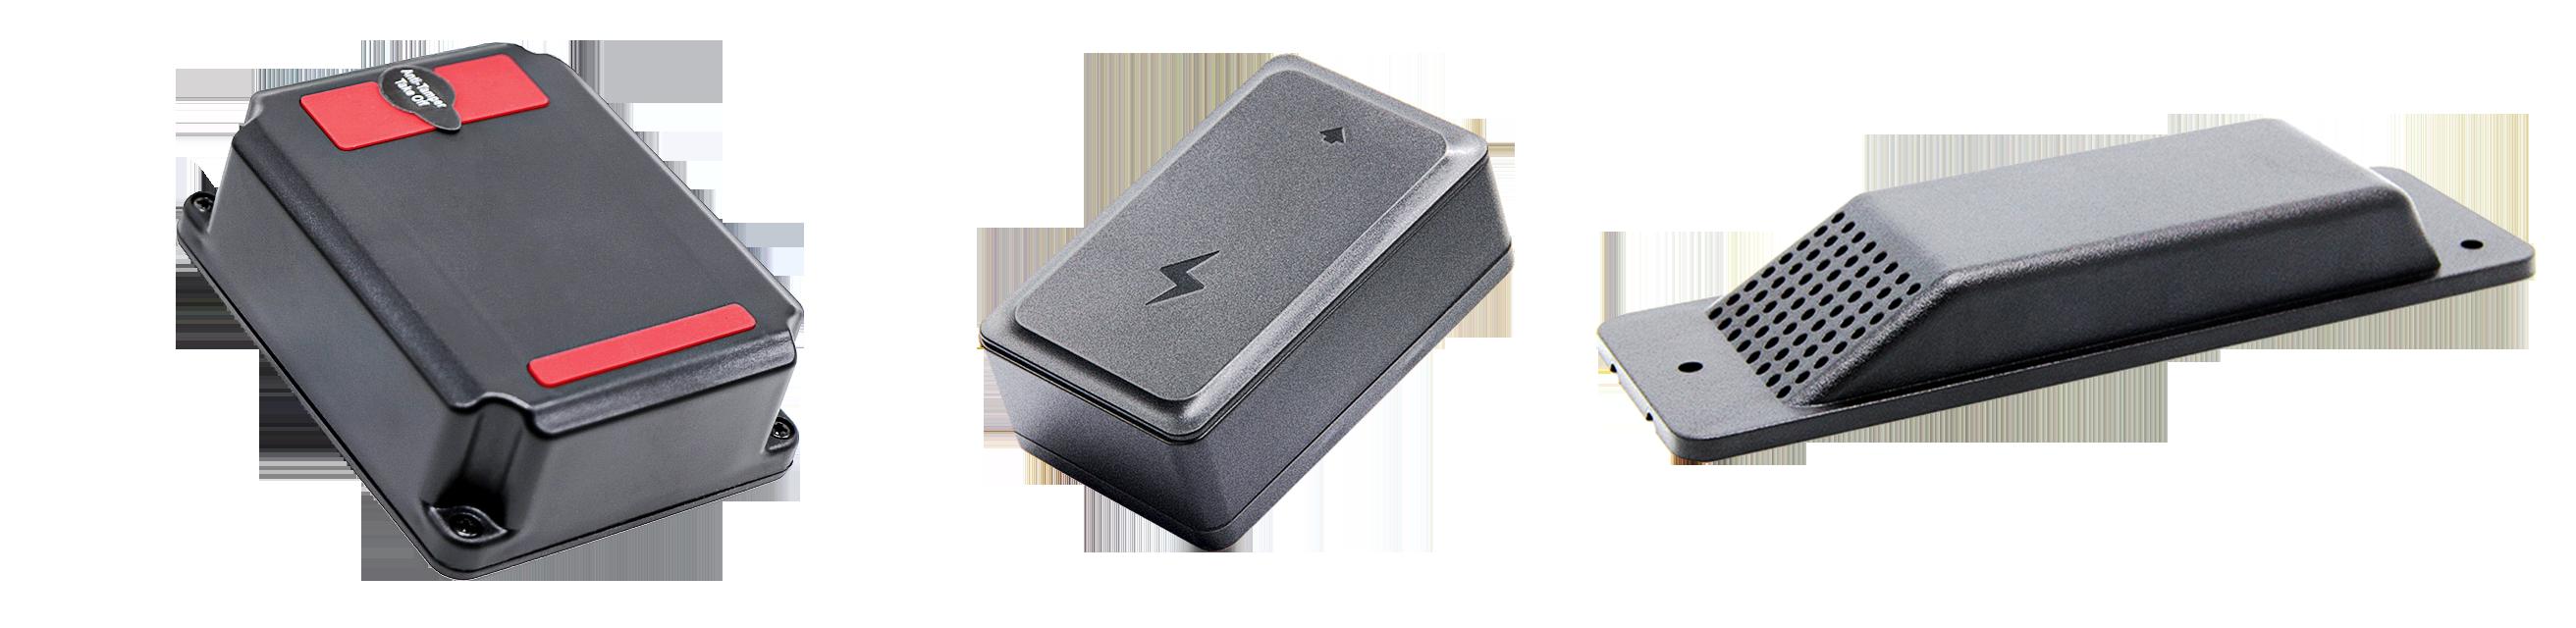 4G wireless tracker LTS-3YSN (16)